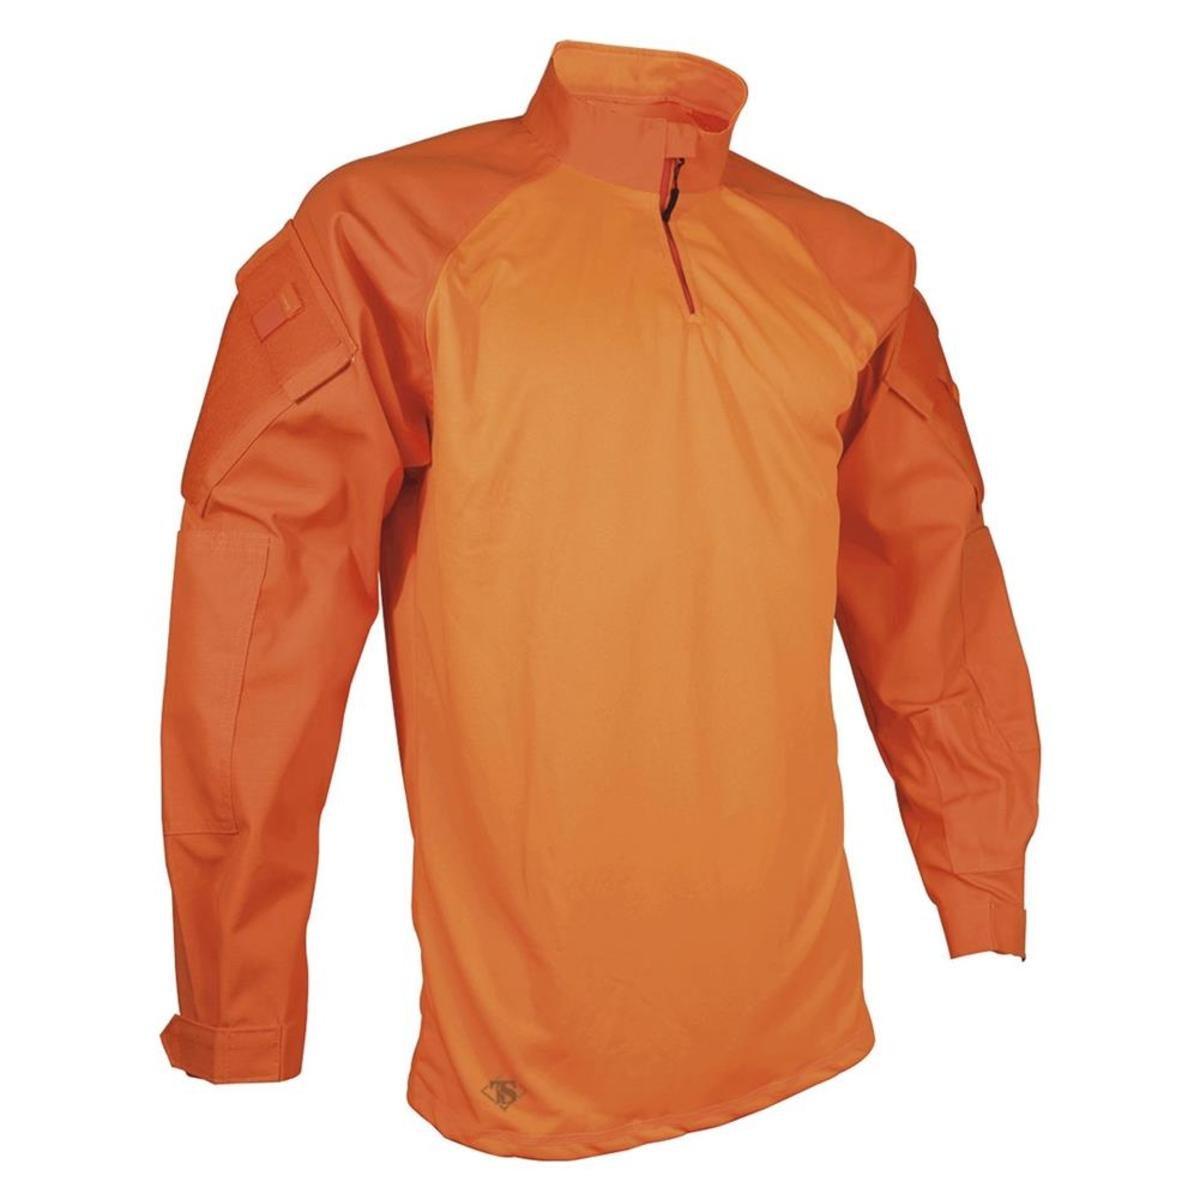 Tru-Spec Combat Shirt, Tru Org P/C Twill 1/4 Zip, Orange, SR by Tru-Spec